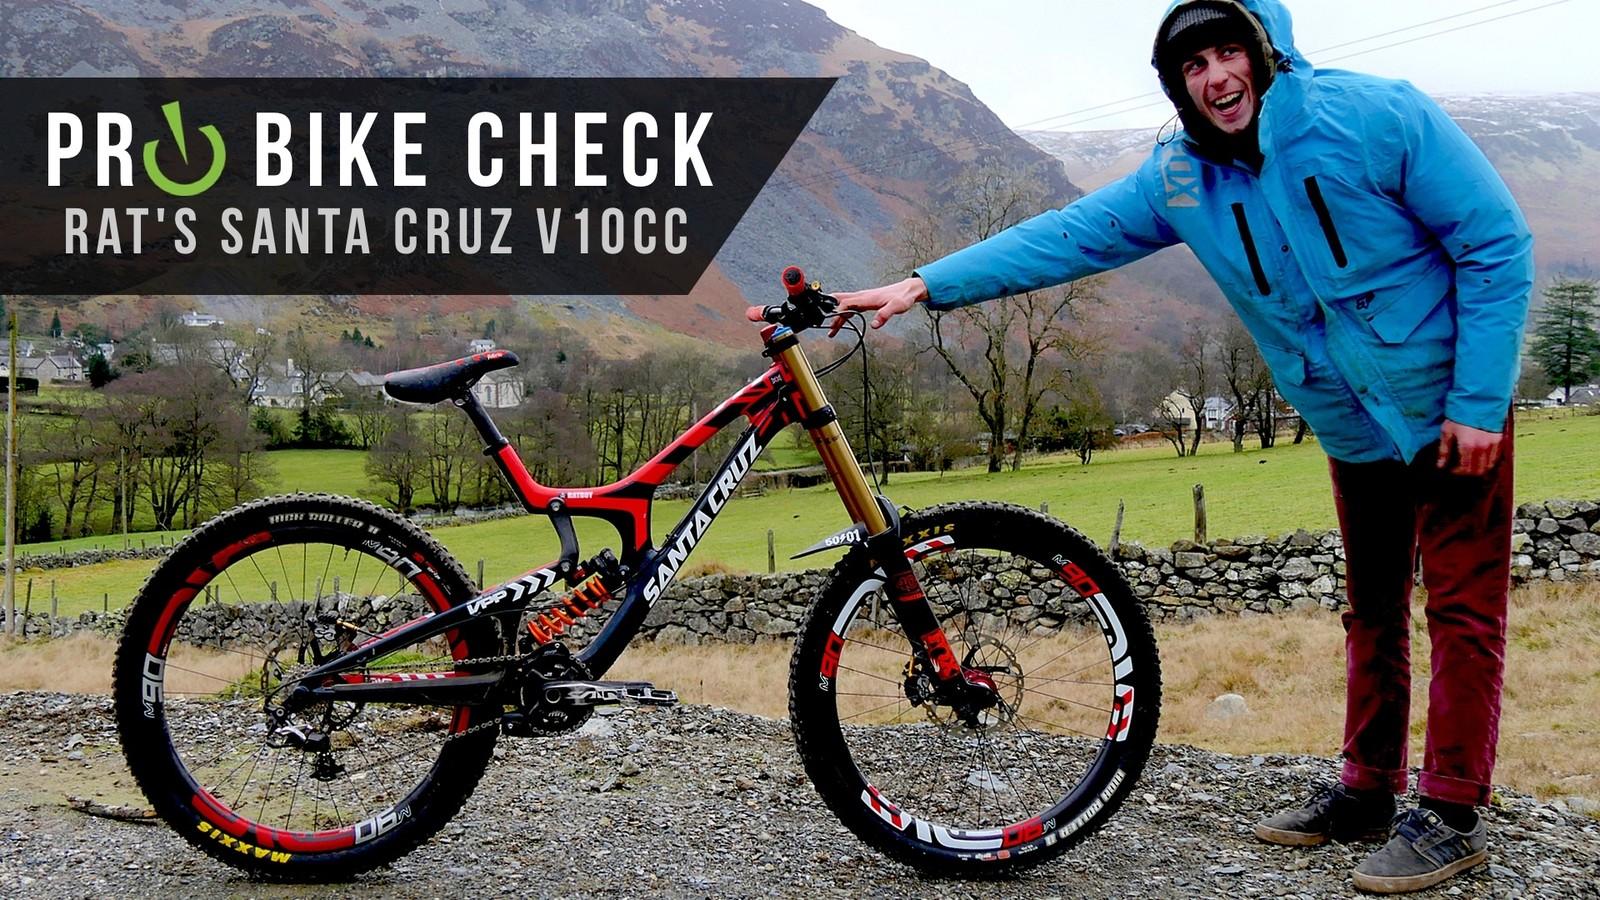 Pro Bike Check: Josh Bryceland's Santa Cruz V10cc